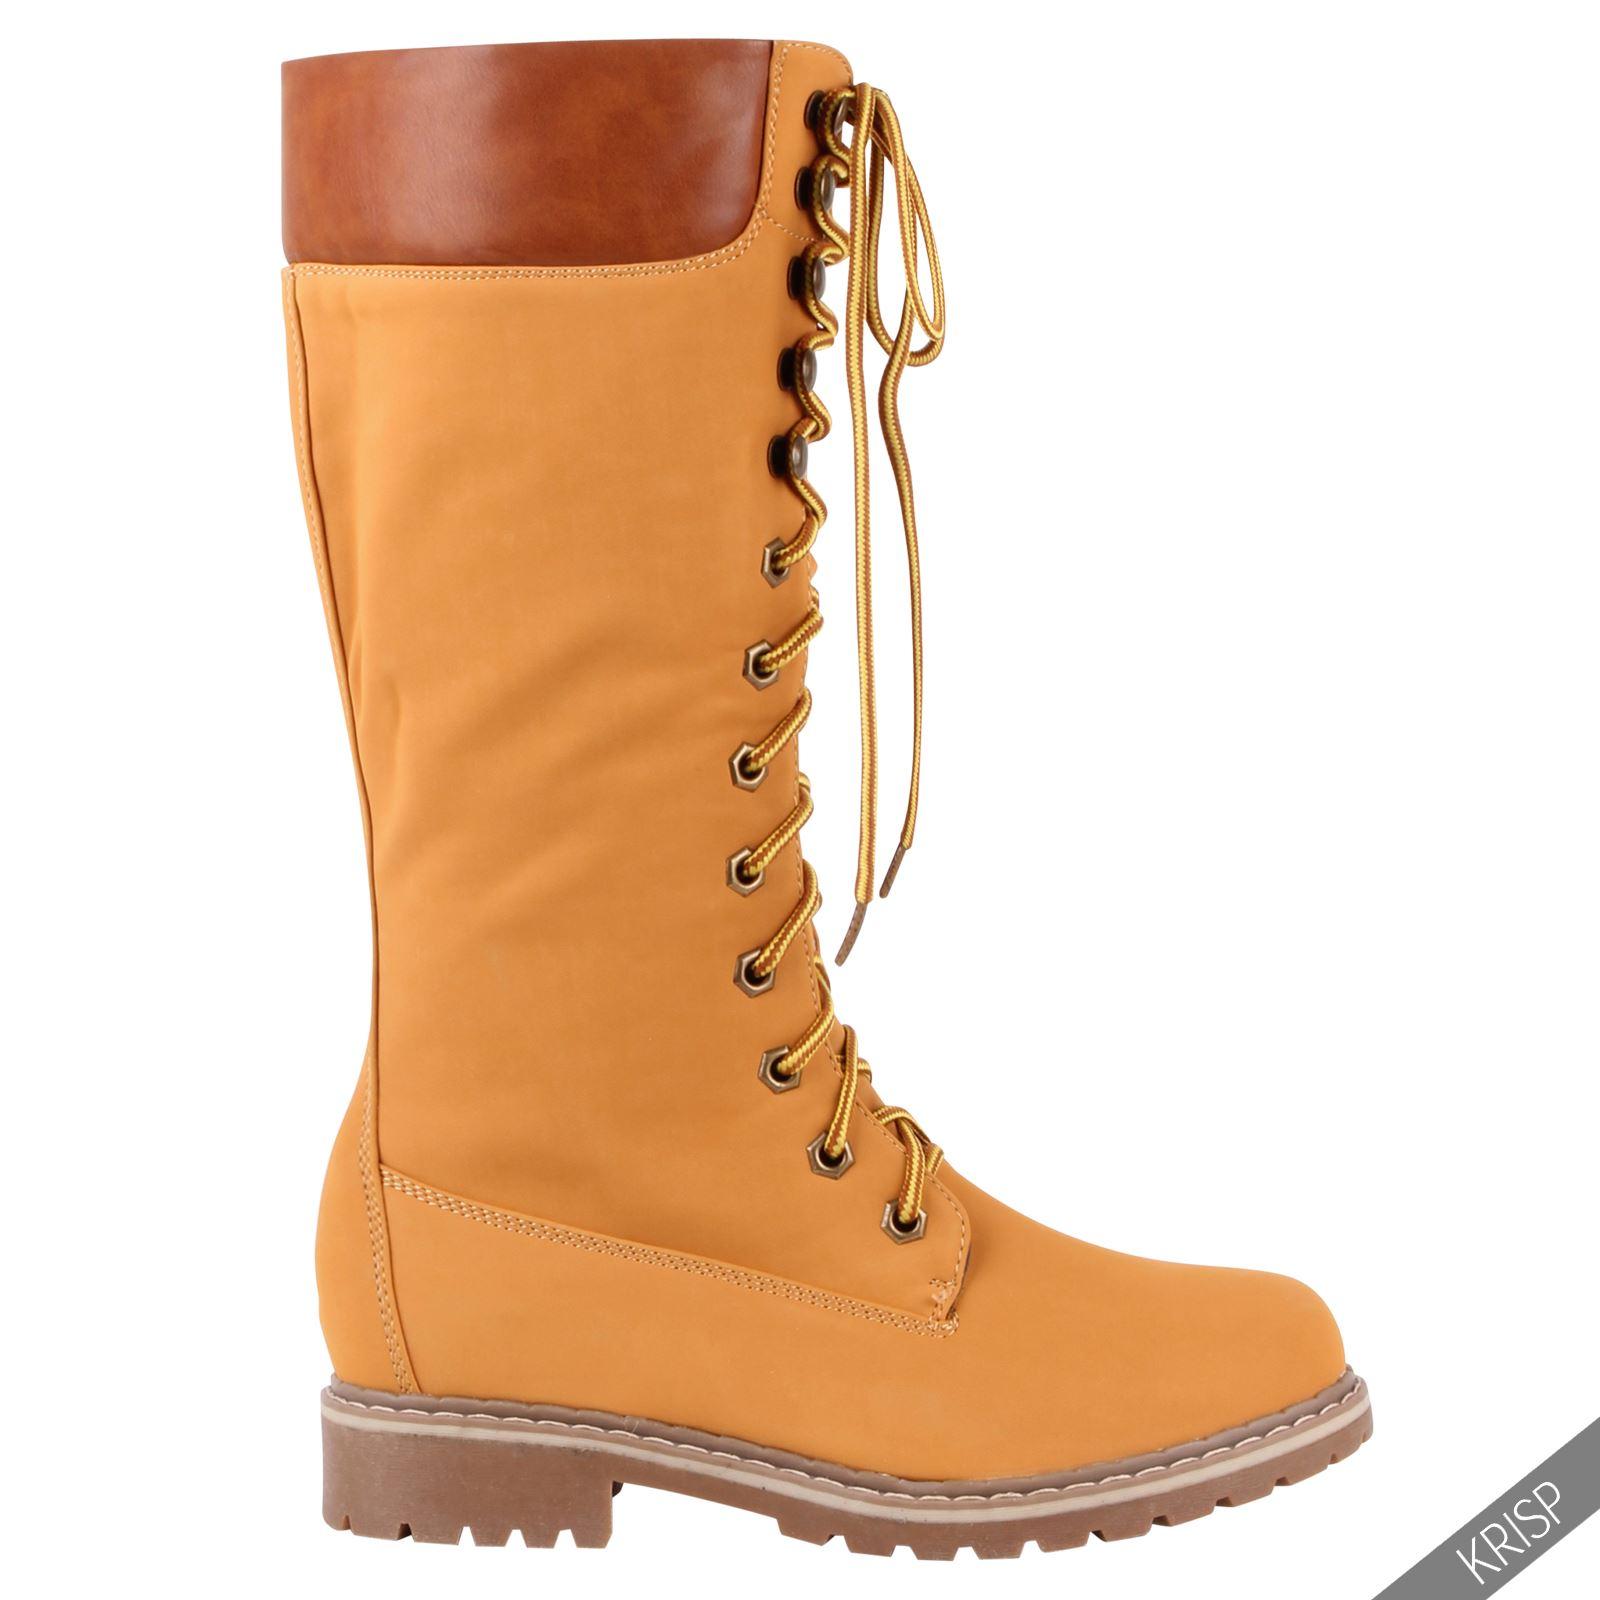 Botines-Mujer-Camel-Bota-Plana-Suela-Goma-Cordones-Casual-Otono-Invierno-Tacon miniatura 14